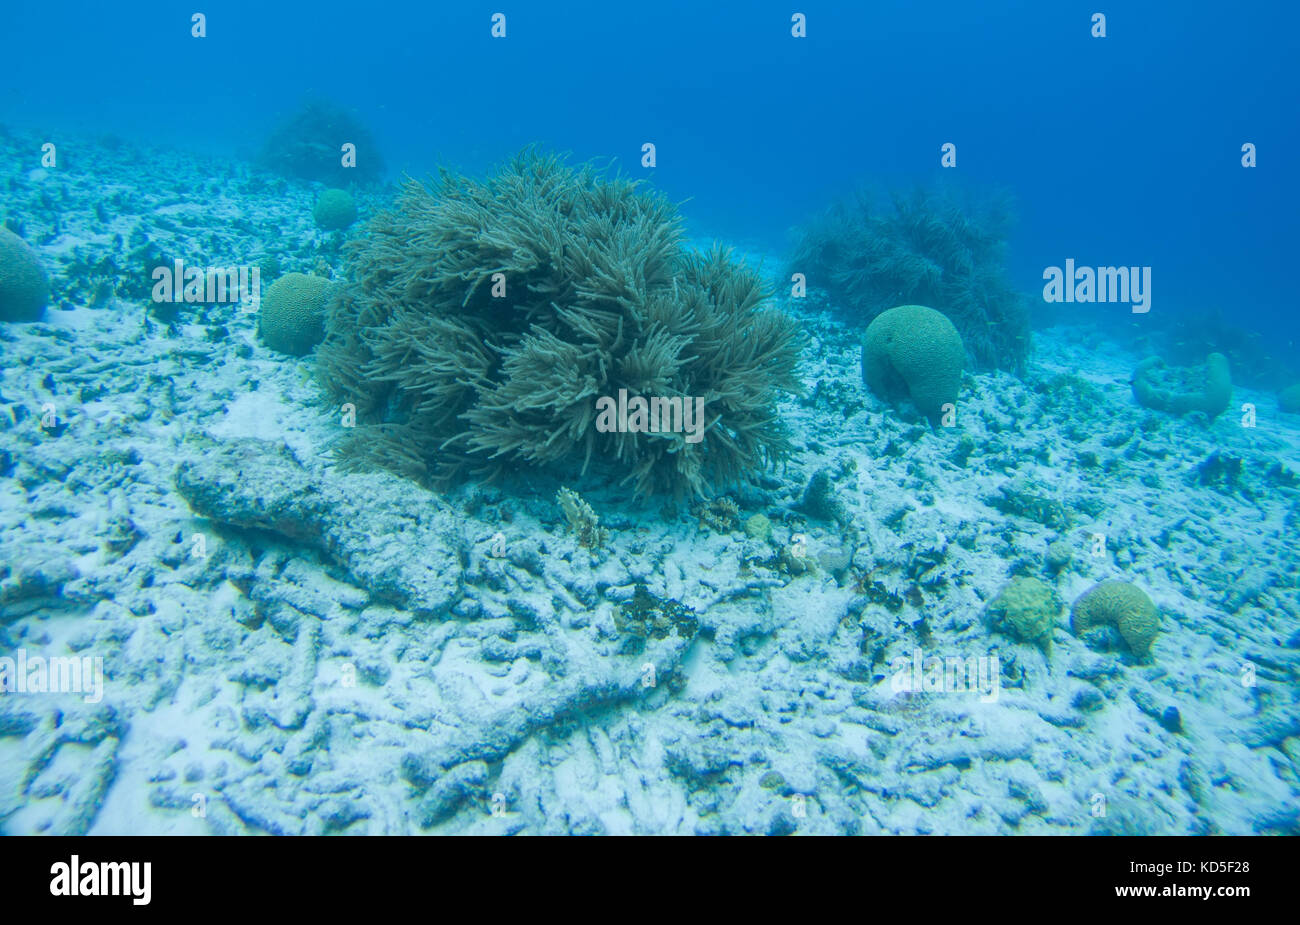 Caribbean Sea Animal Life: Deep Sea Animals Stock Photos & Deep Sea Animals Stock